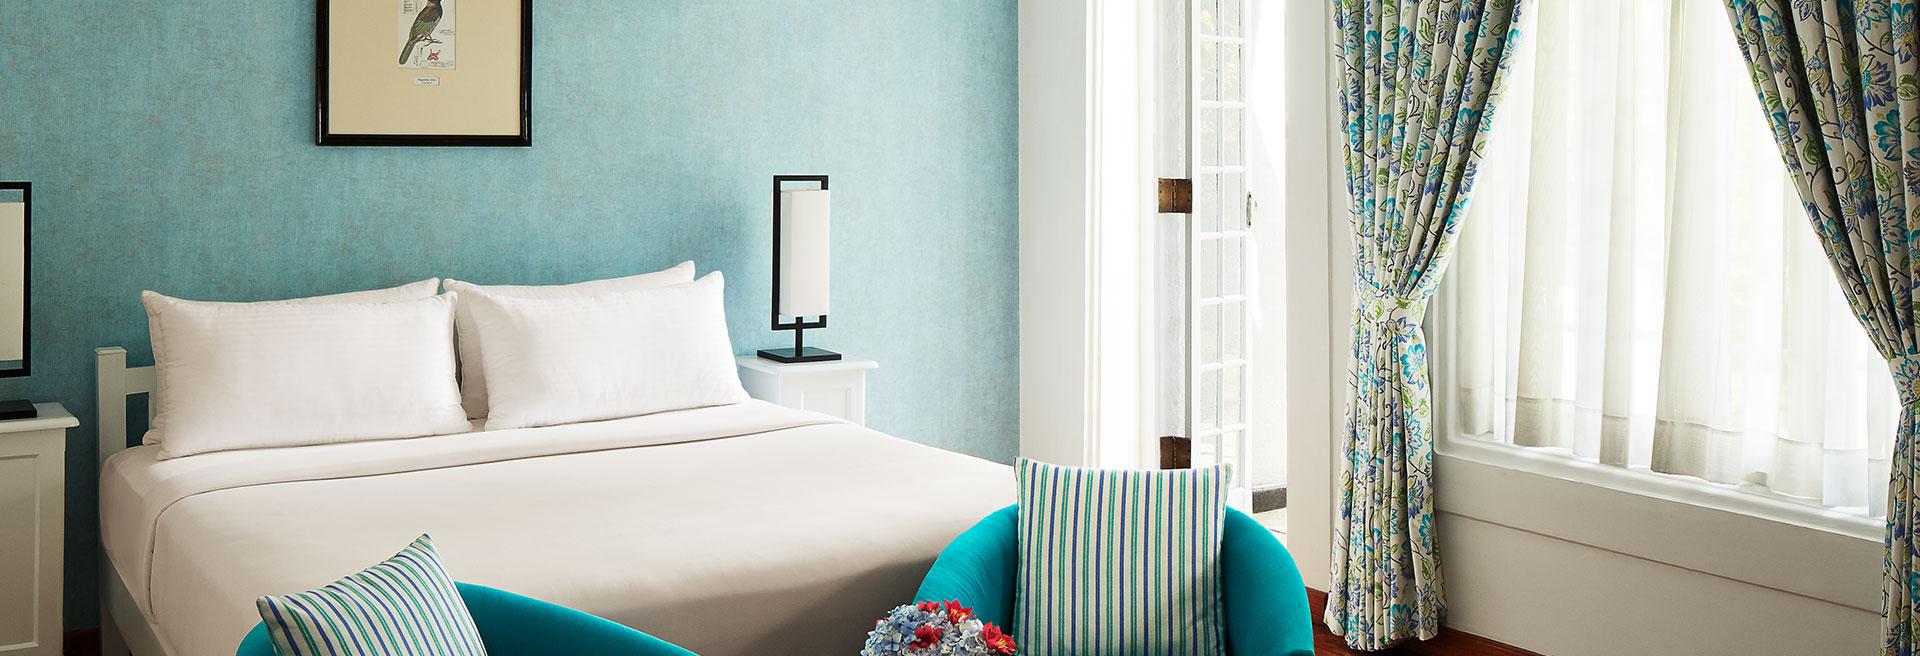 Lavishly decorated hotel room